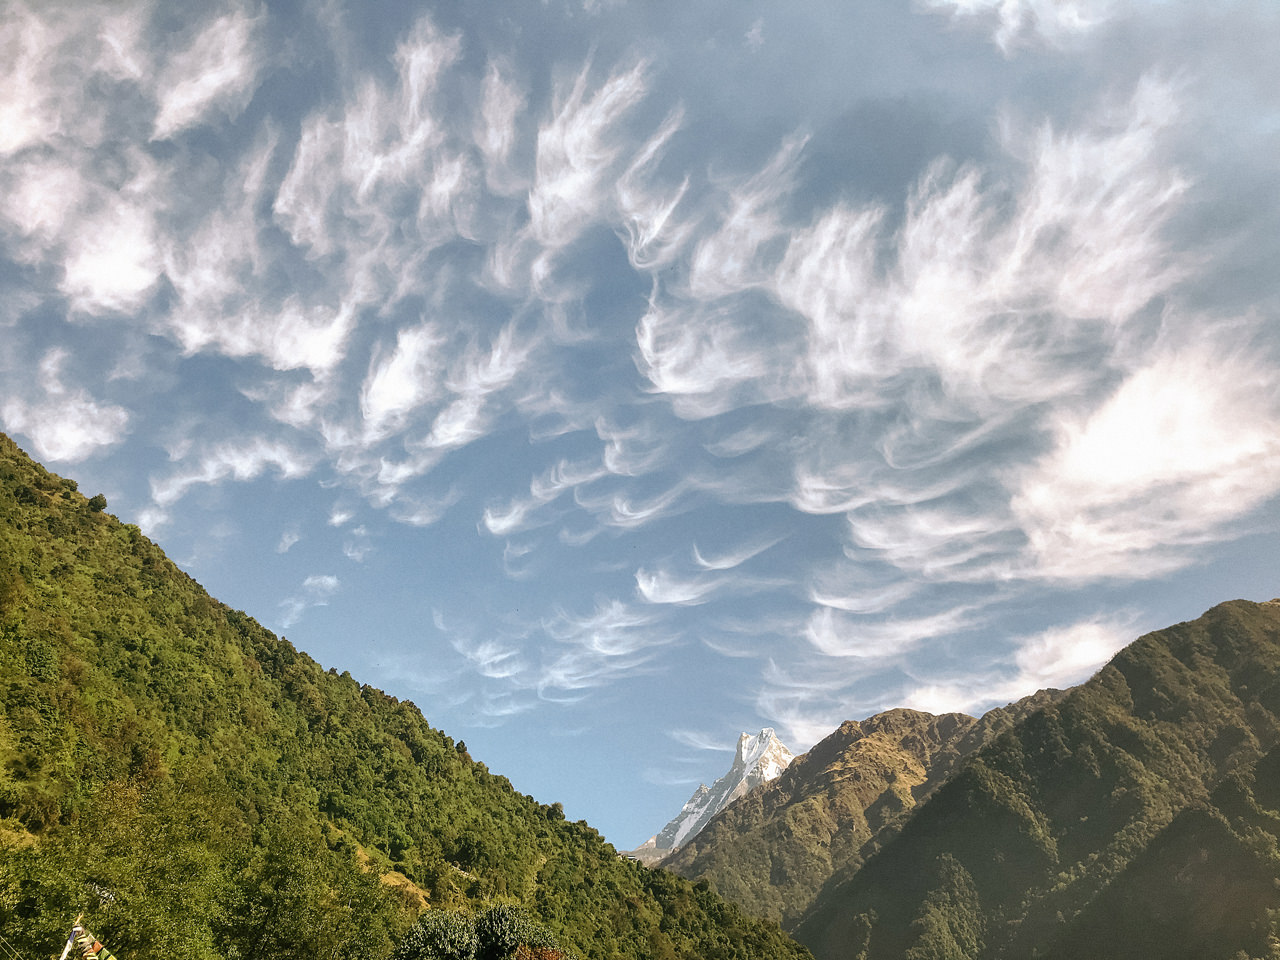 Nepal 2019 - Trekking Annapurna Base Camp 91